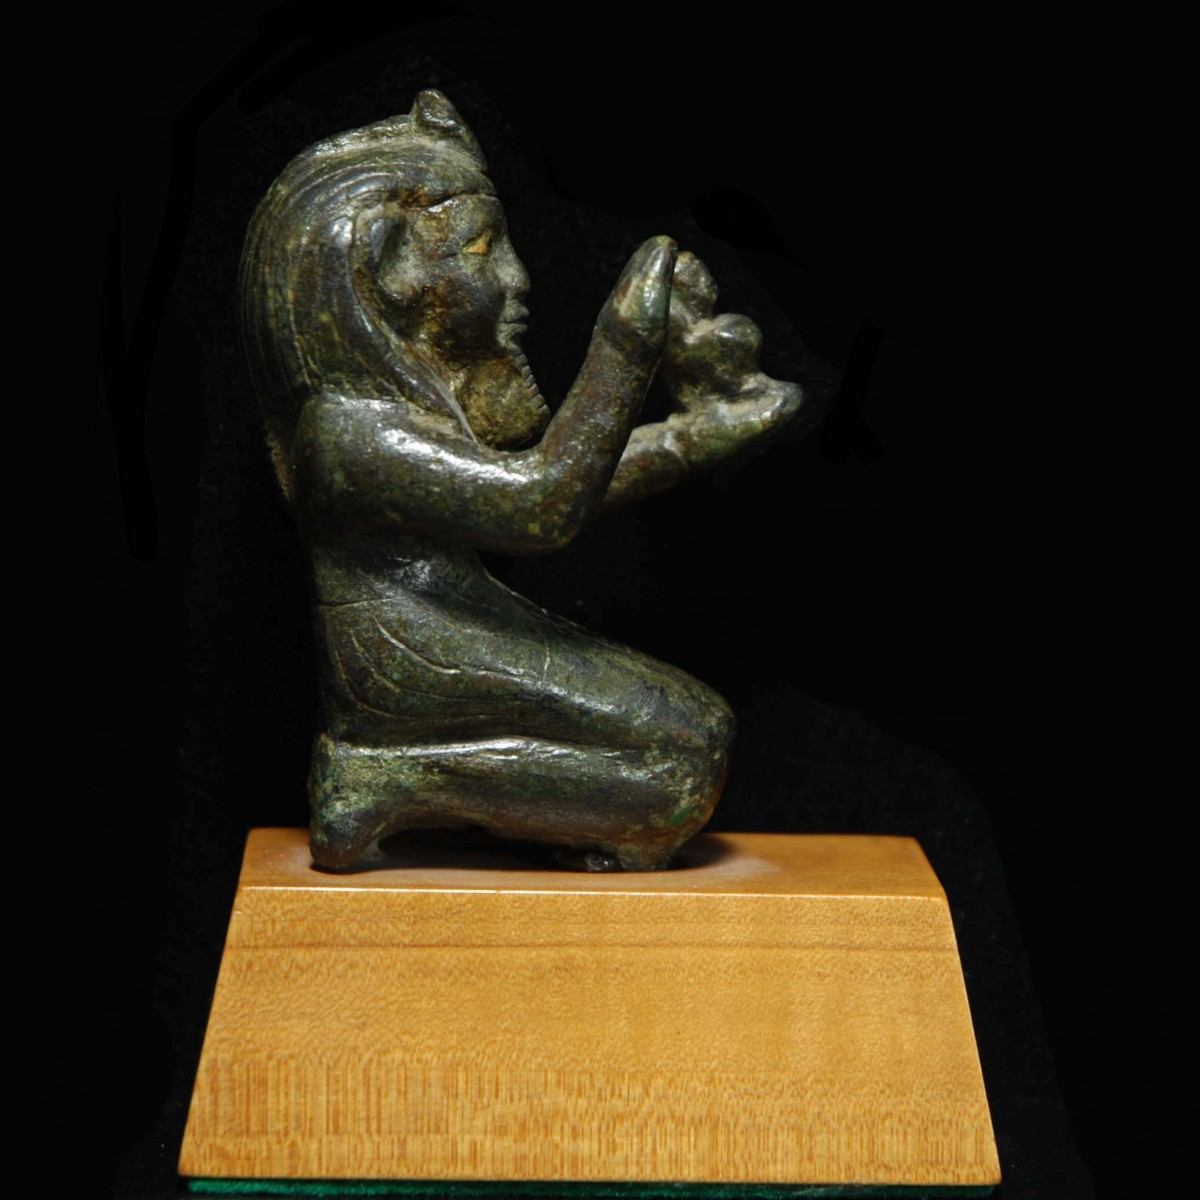 Egyptian Bronze statue of the kneeling pharaoh Taharqa right